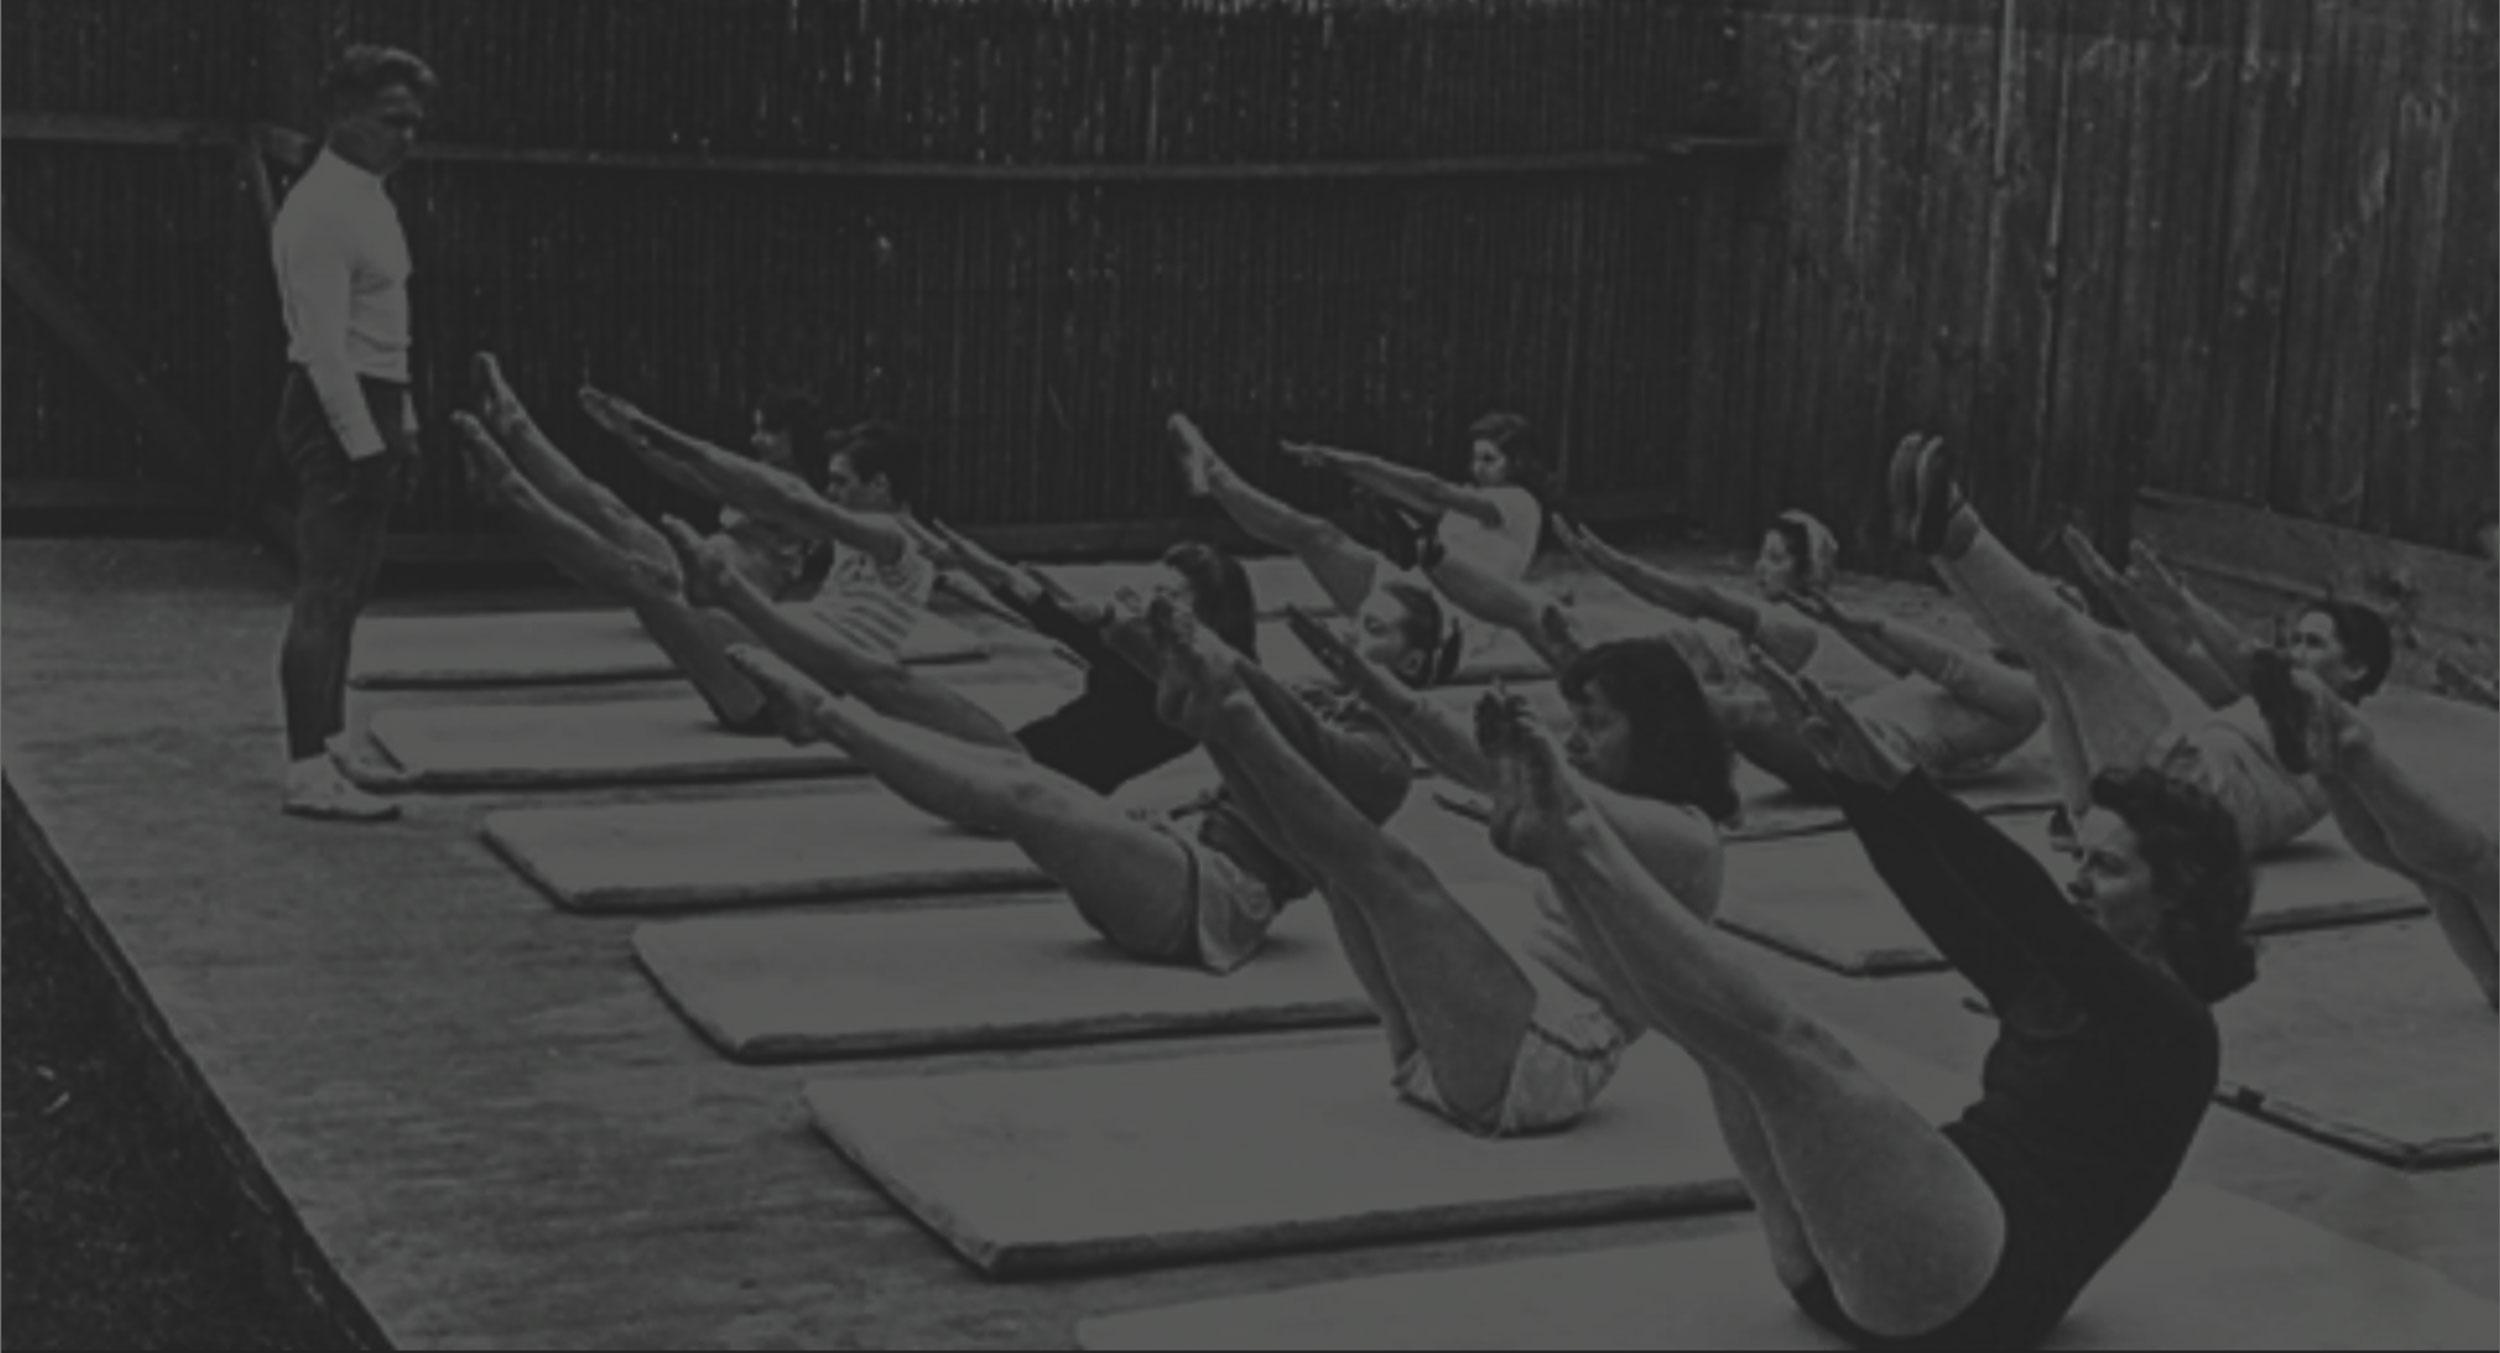 The legacy of Joseph Pilates